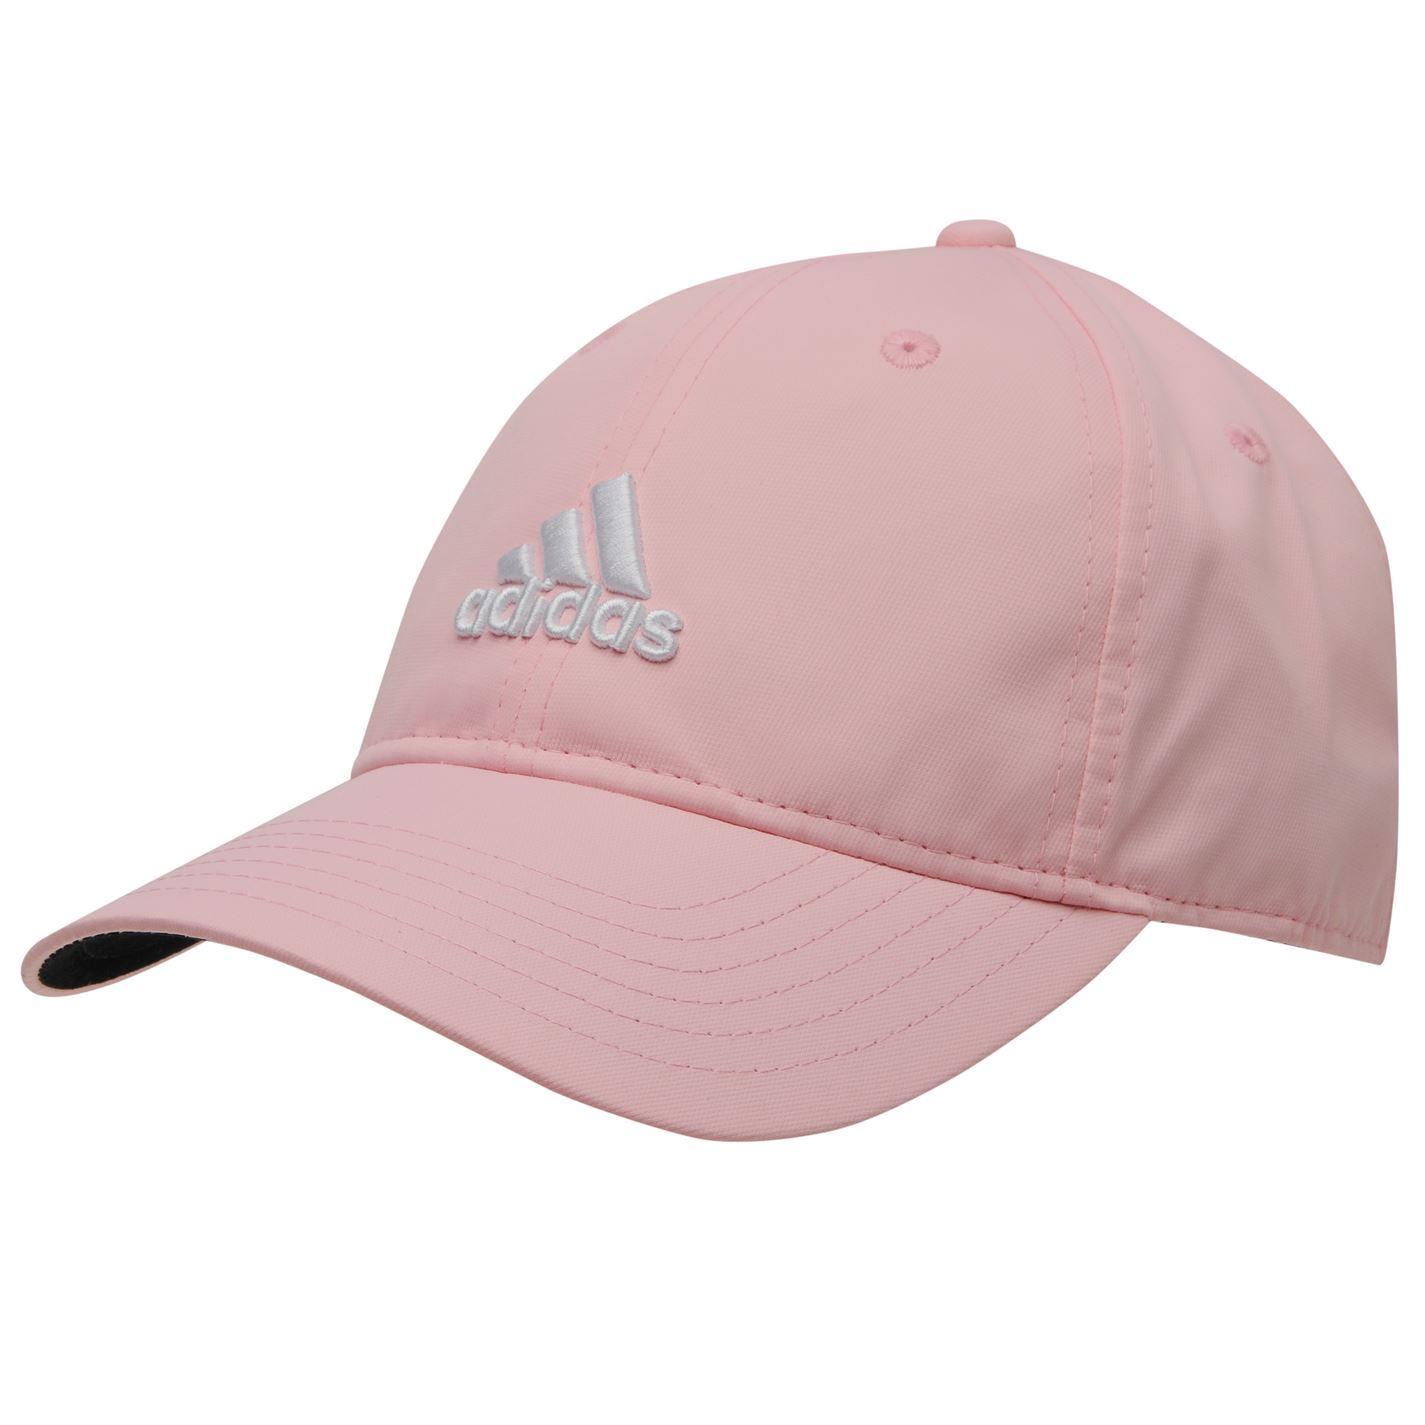 adidas golf baseball cap mens pink peaked sports hat ebay